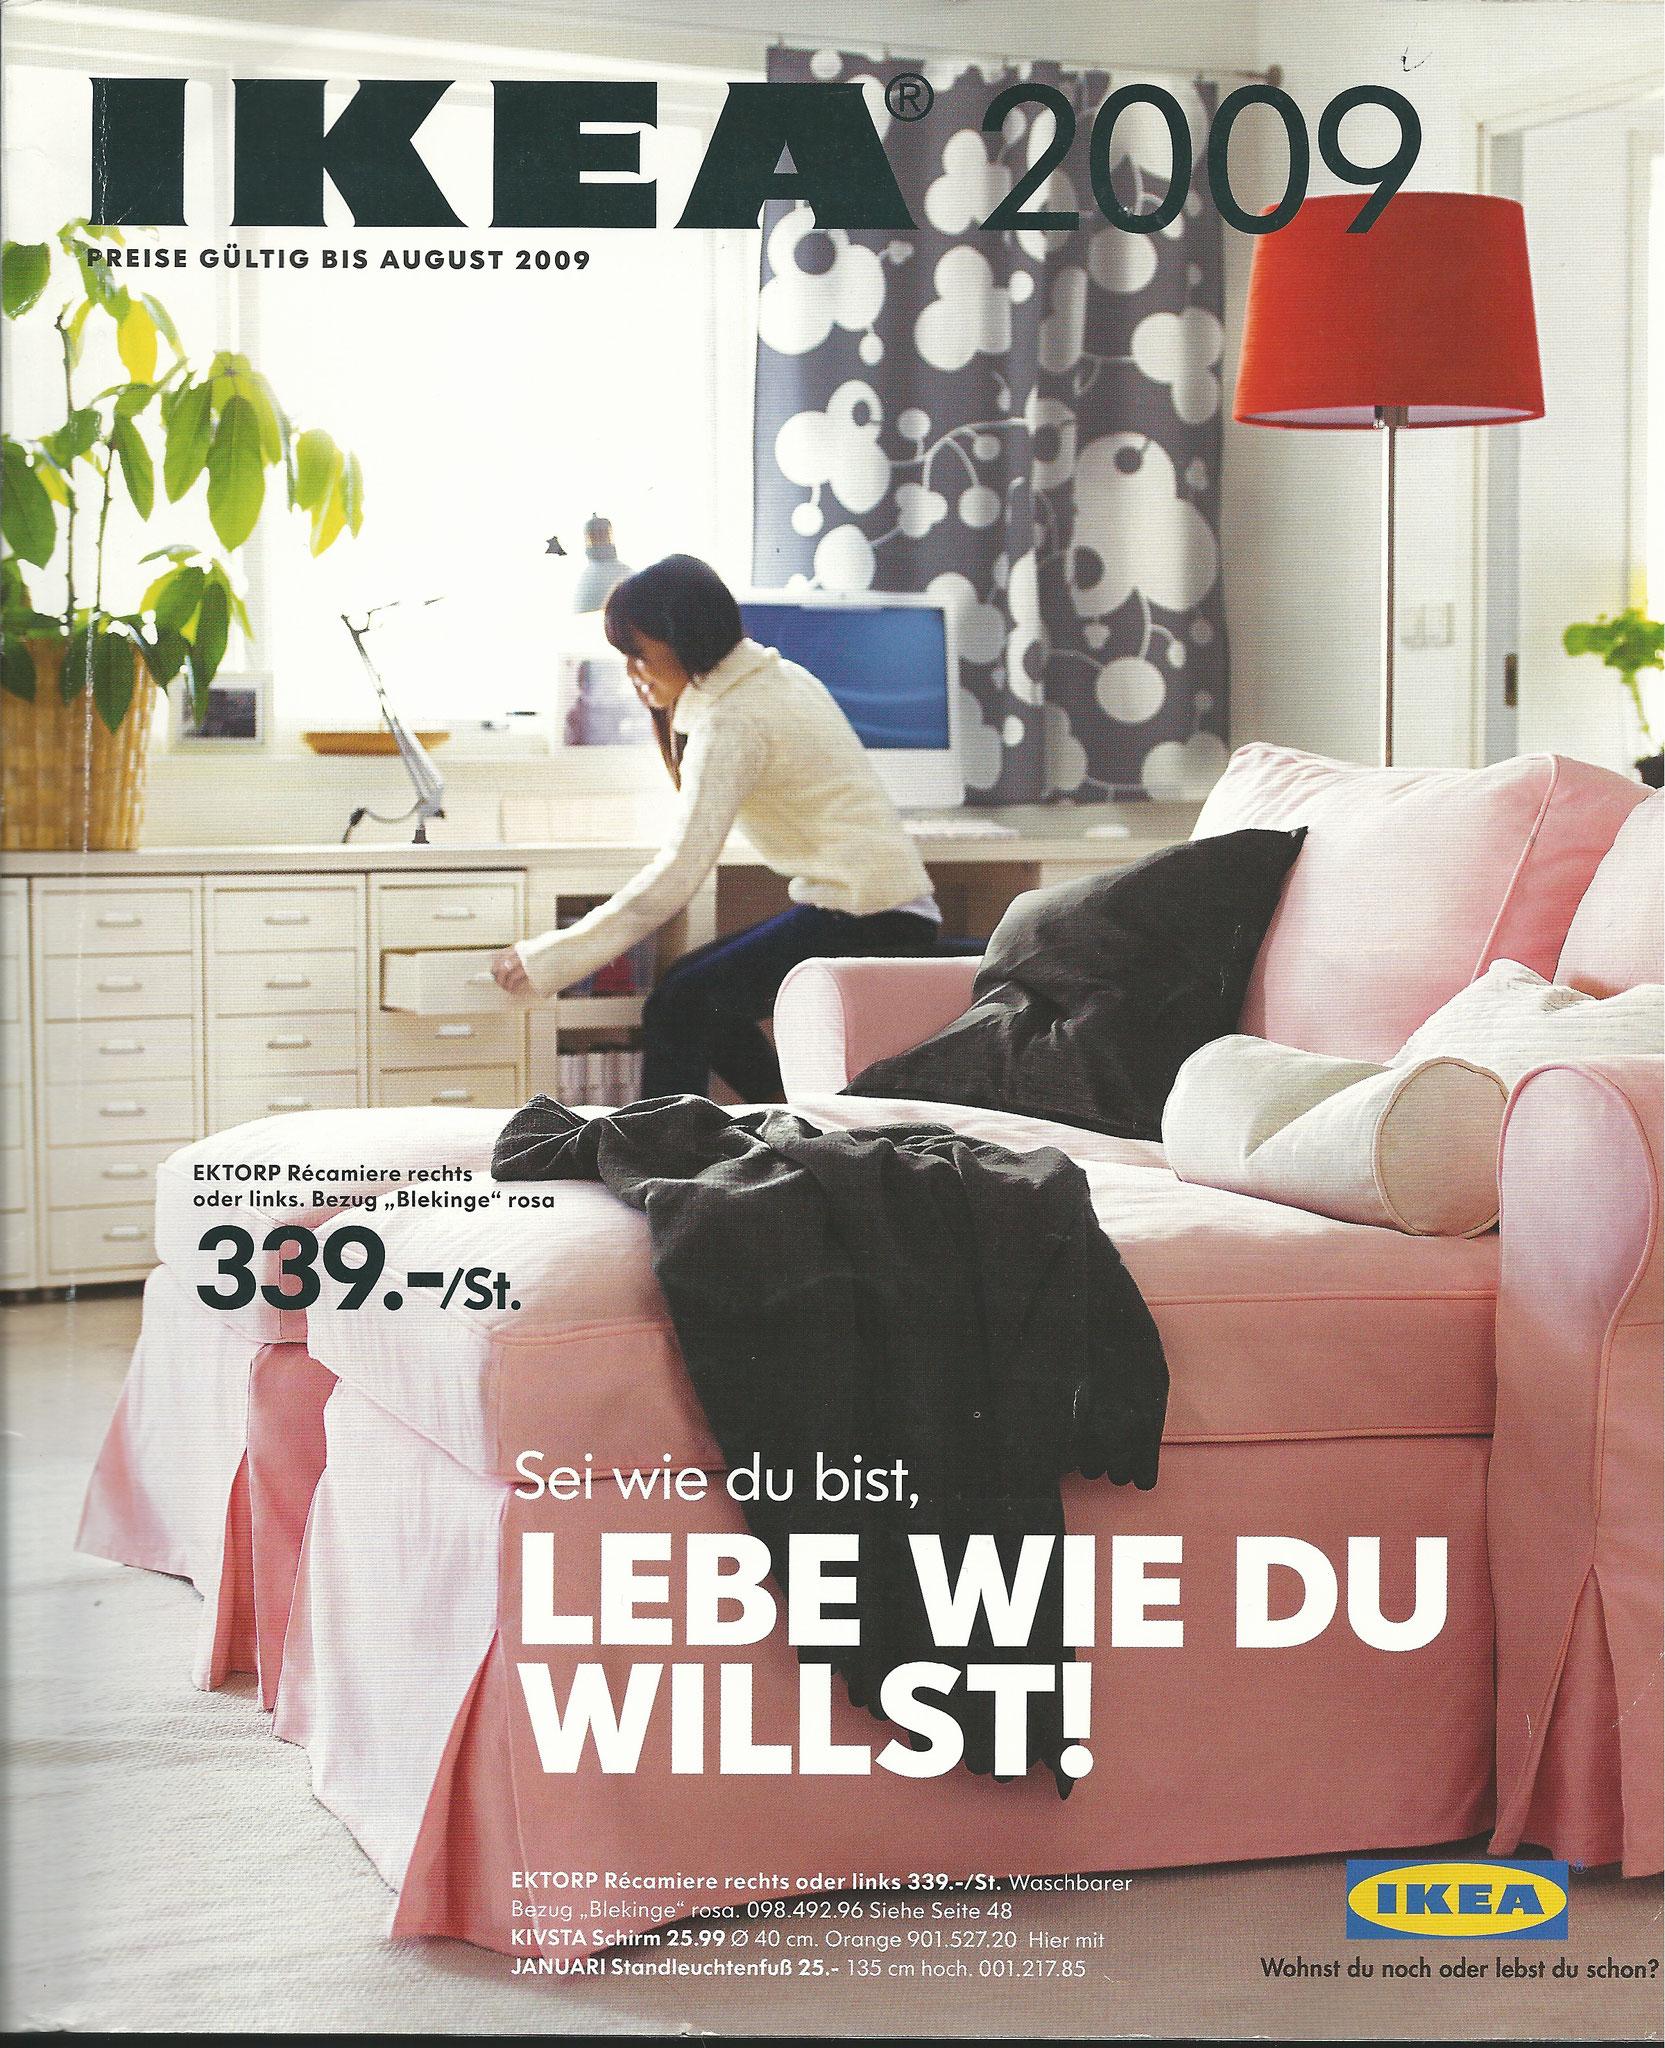 IKEA, LUFTHANSA, JAGUAR, PROCTER & GAMBLE, MILES & MORE, LAND ROVER ...